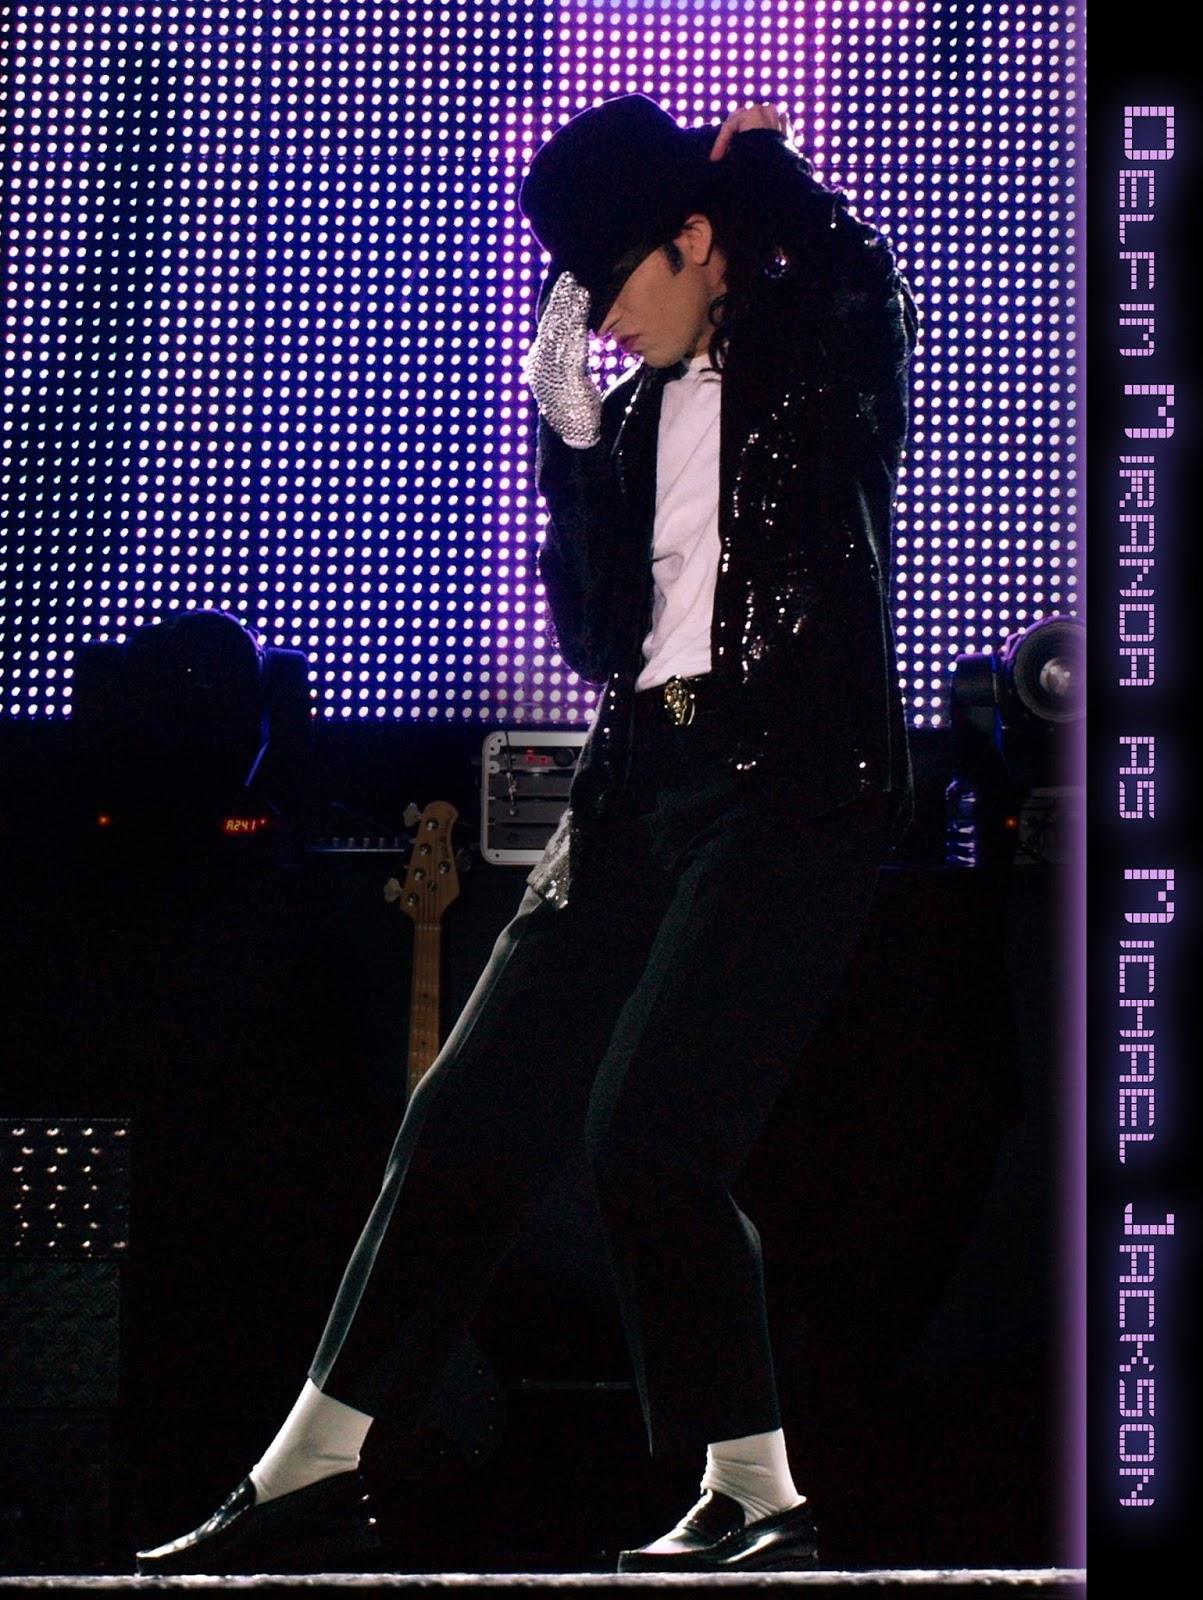 Delfim Miranda - Michael Jackson Tribute - Billie Jean - Live on Stage